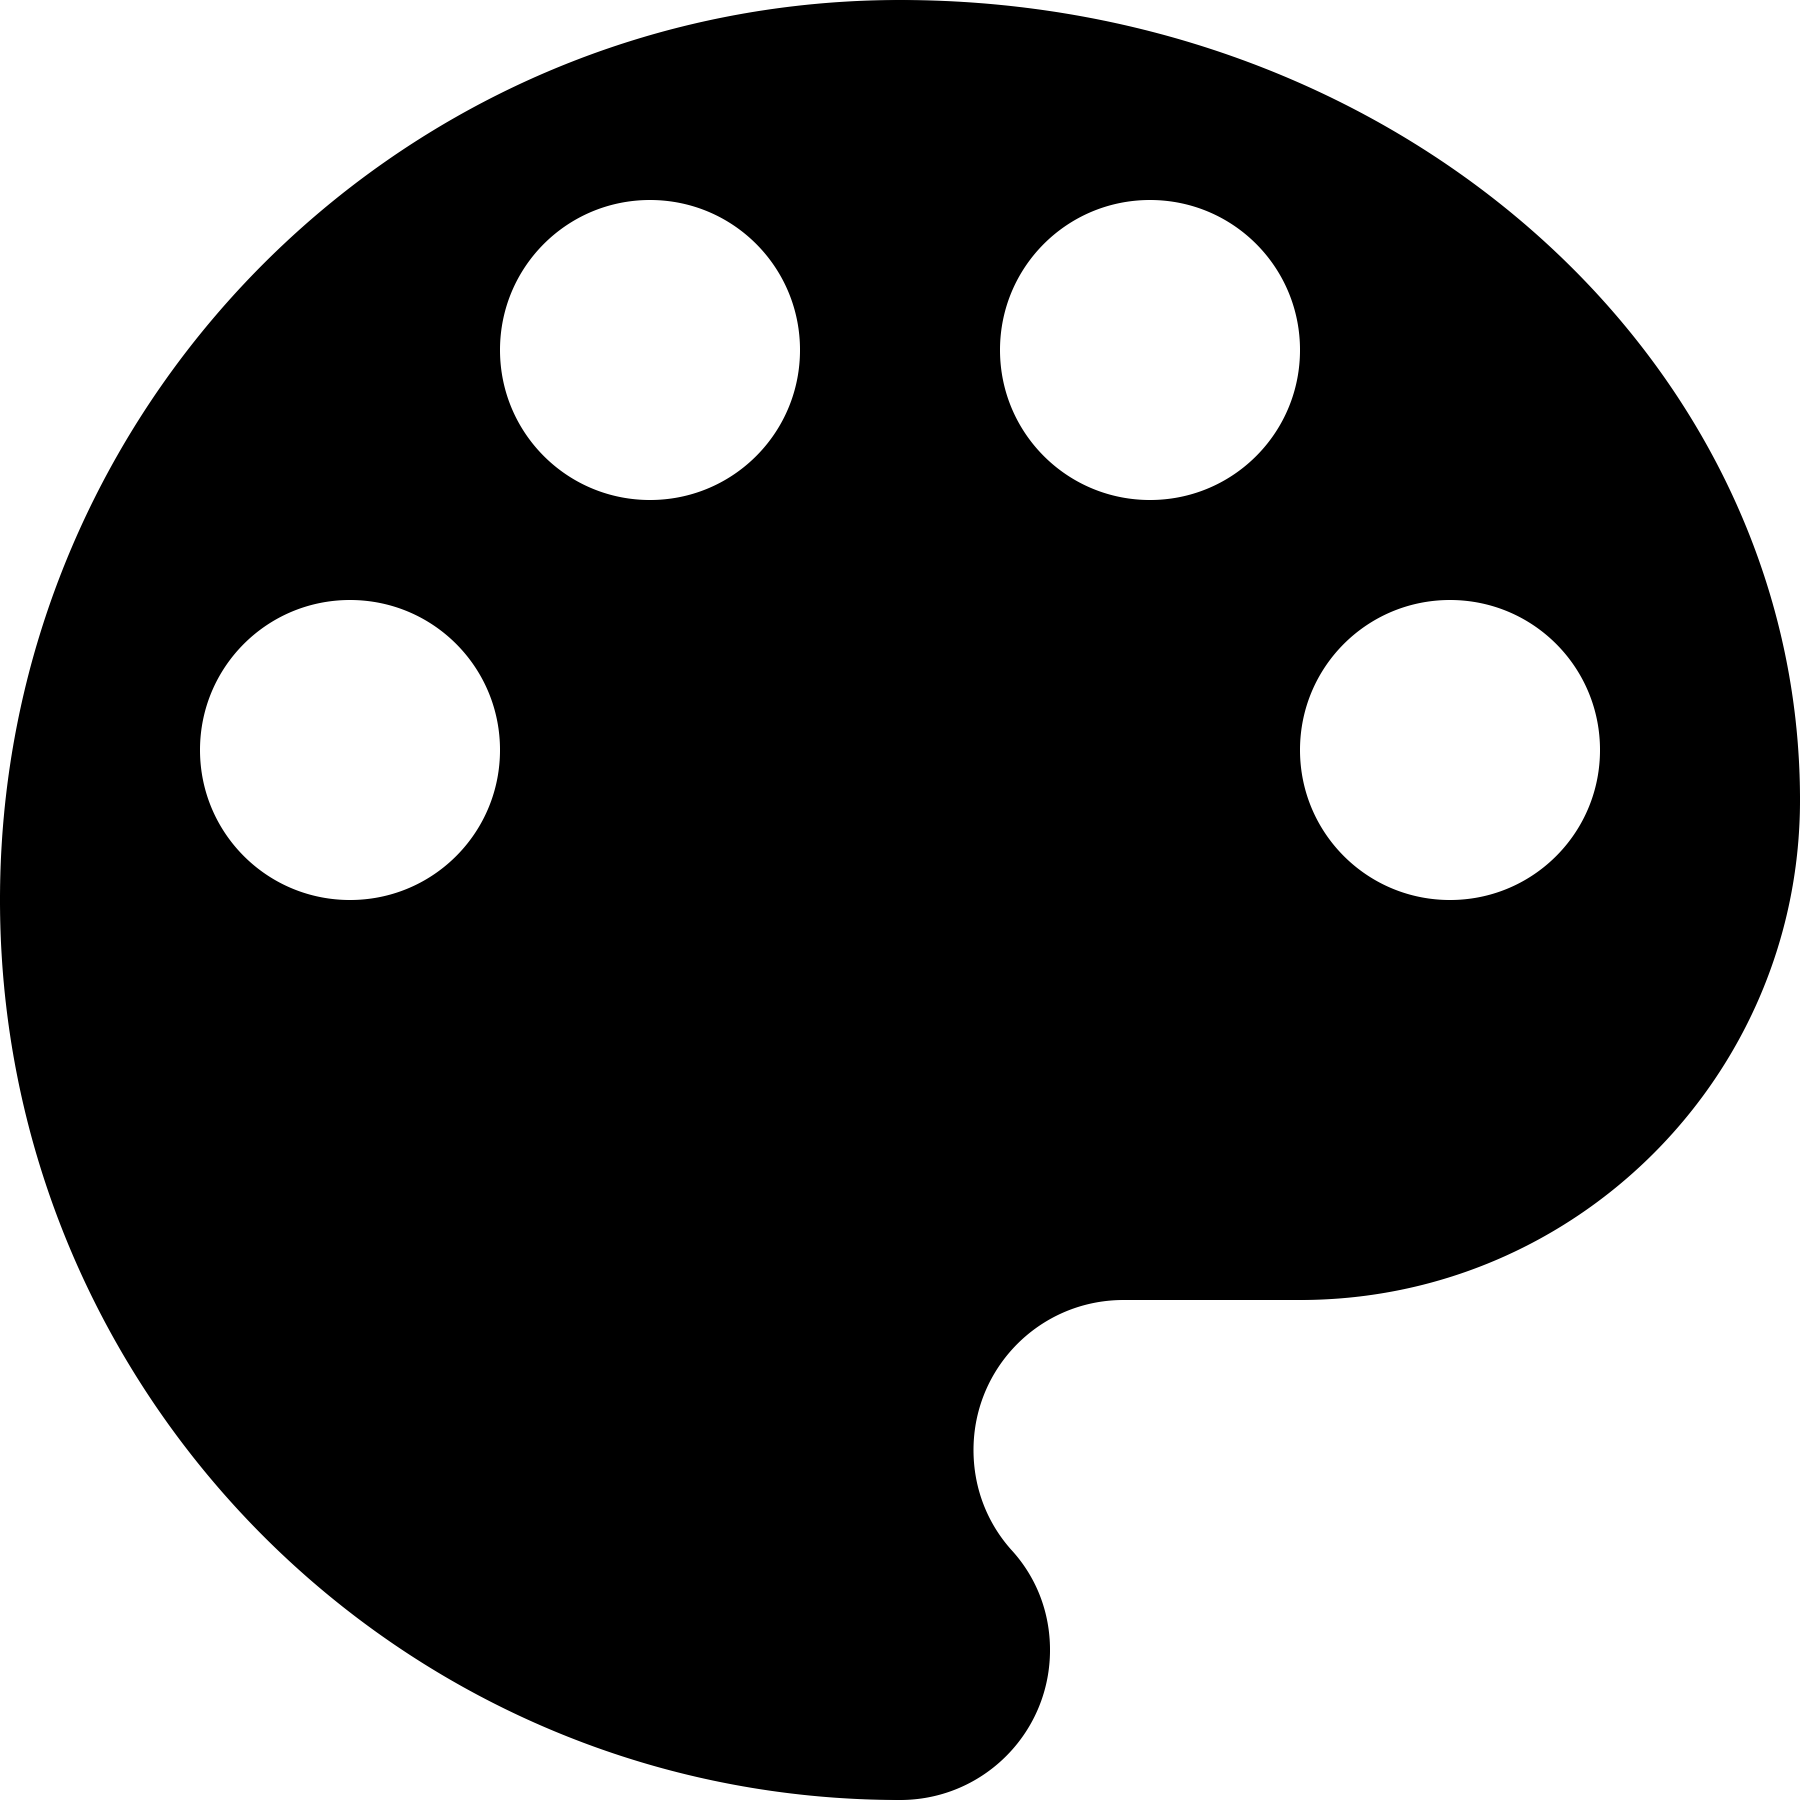 1800x1800 Clip Art Black White Palette Clipart, Free Clip Art Black